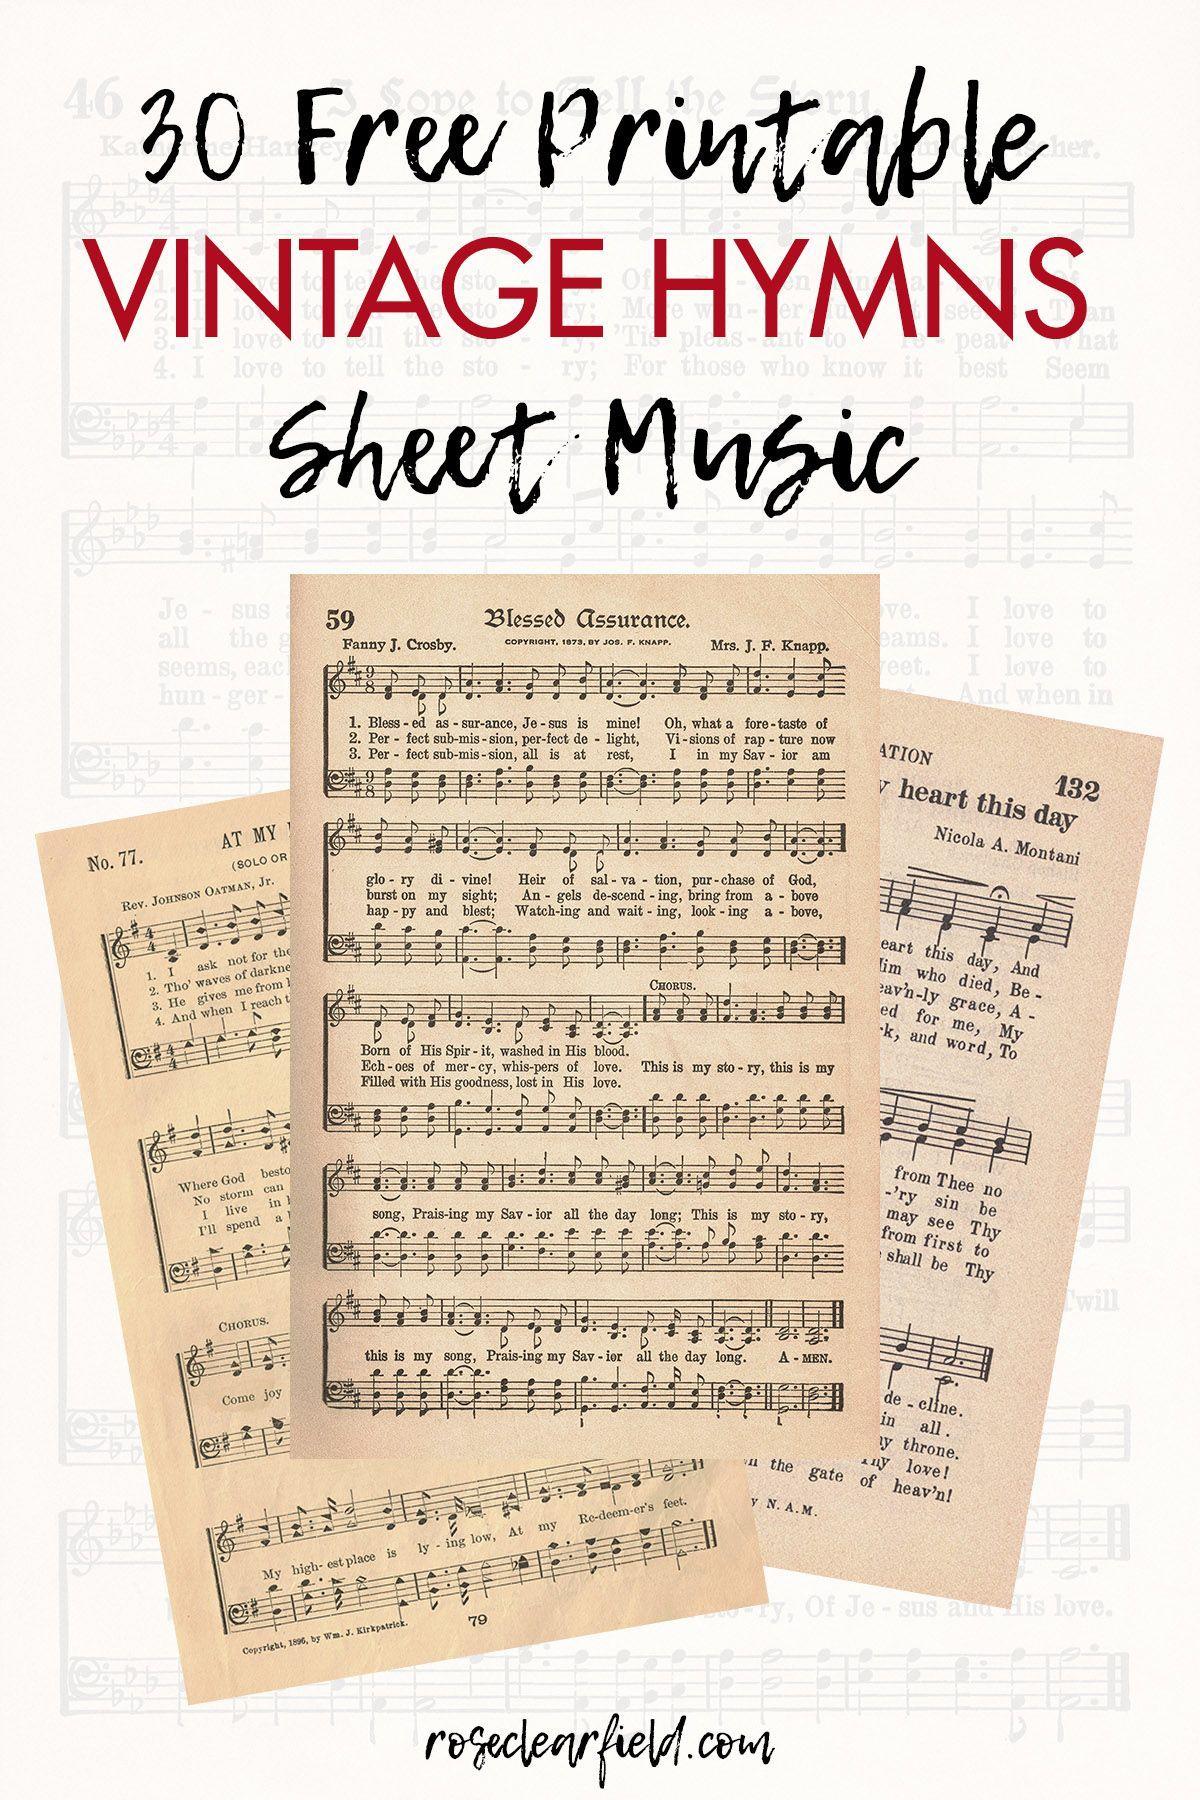 FREE Printable Vintage Hymns Sheet Music #craftprojects 30 FREE printable vintag…